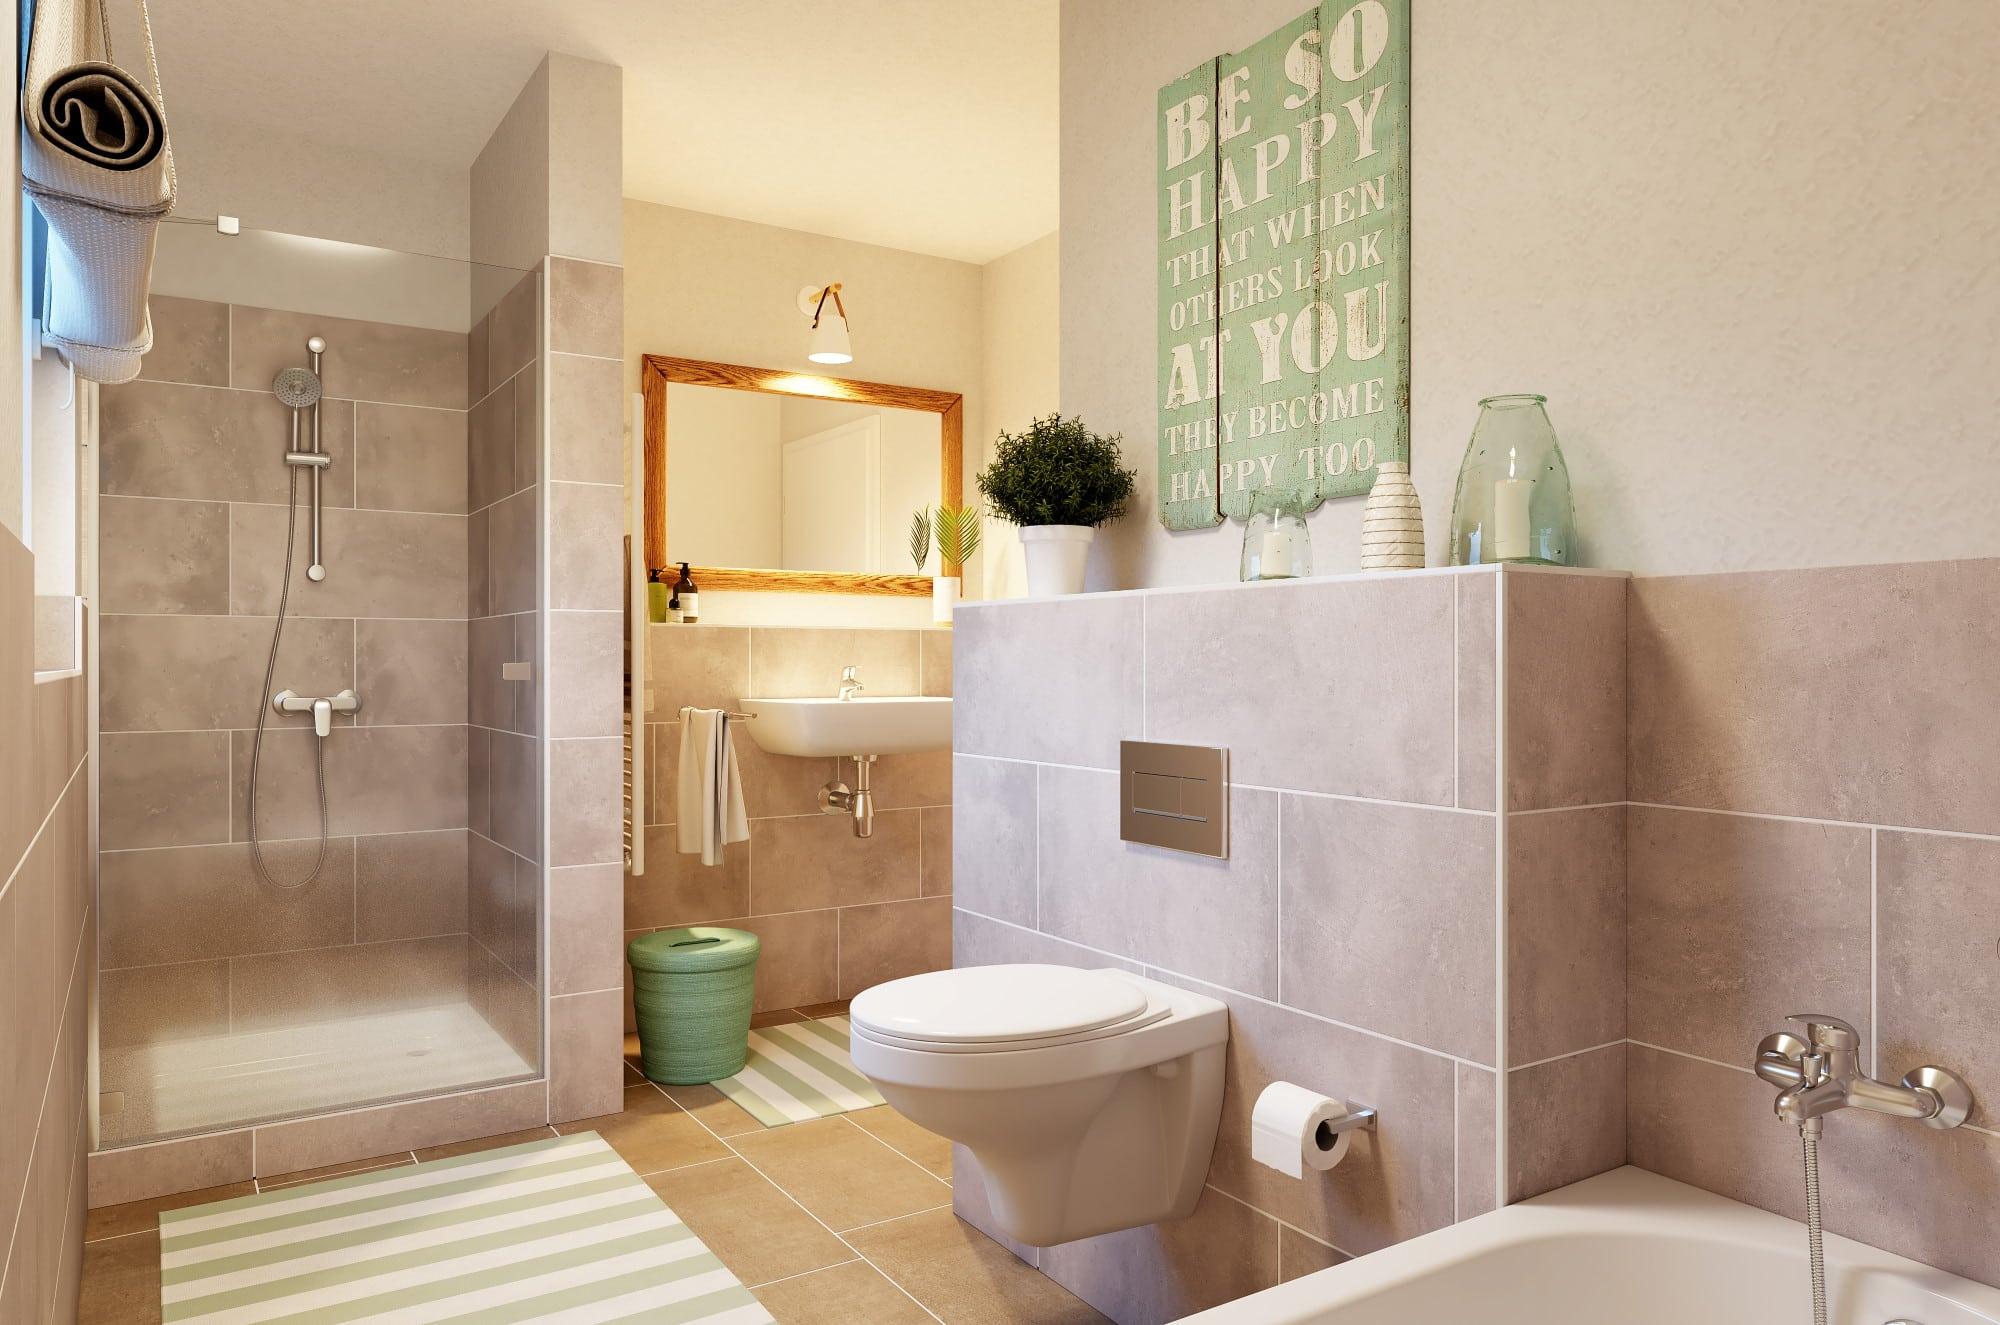 Badezimmer - Haus Design Ideen Inneneinrichtung Town Country Haus Bungalow 78 - HausbauDirekt.de